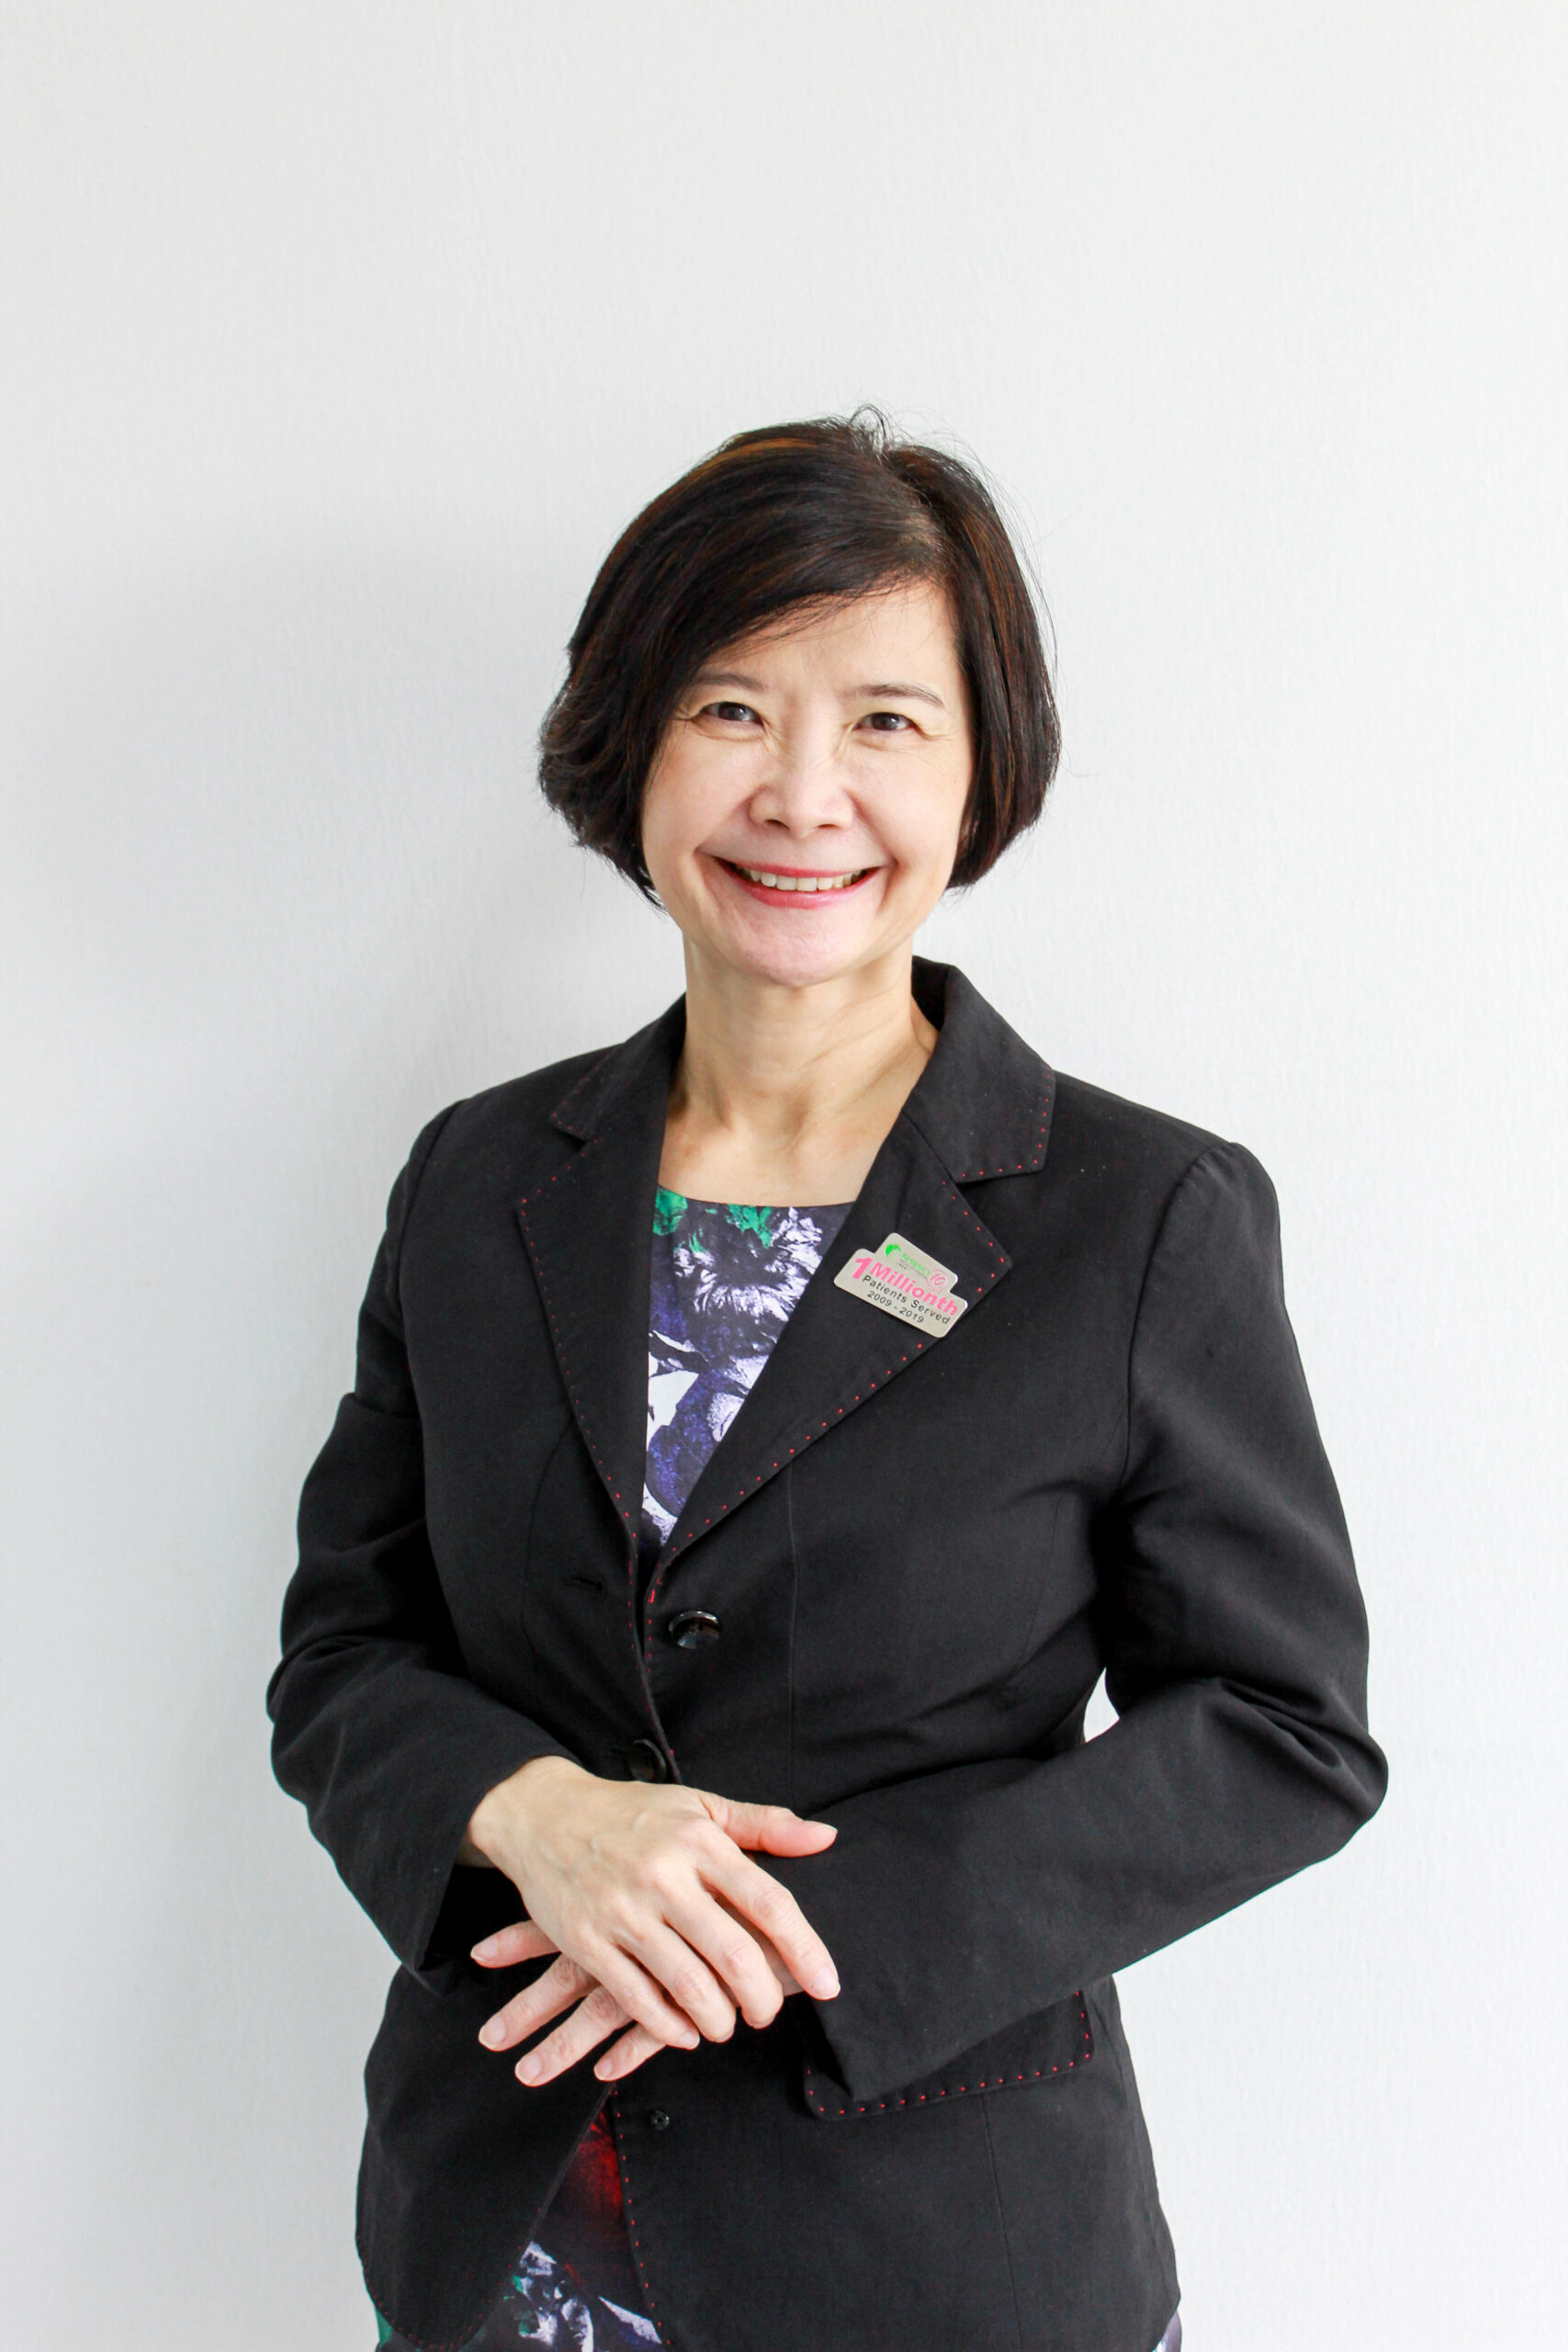 Ms. Serena Yong